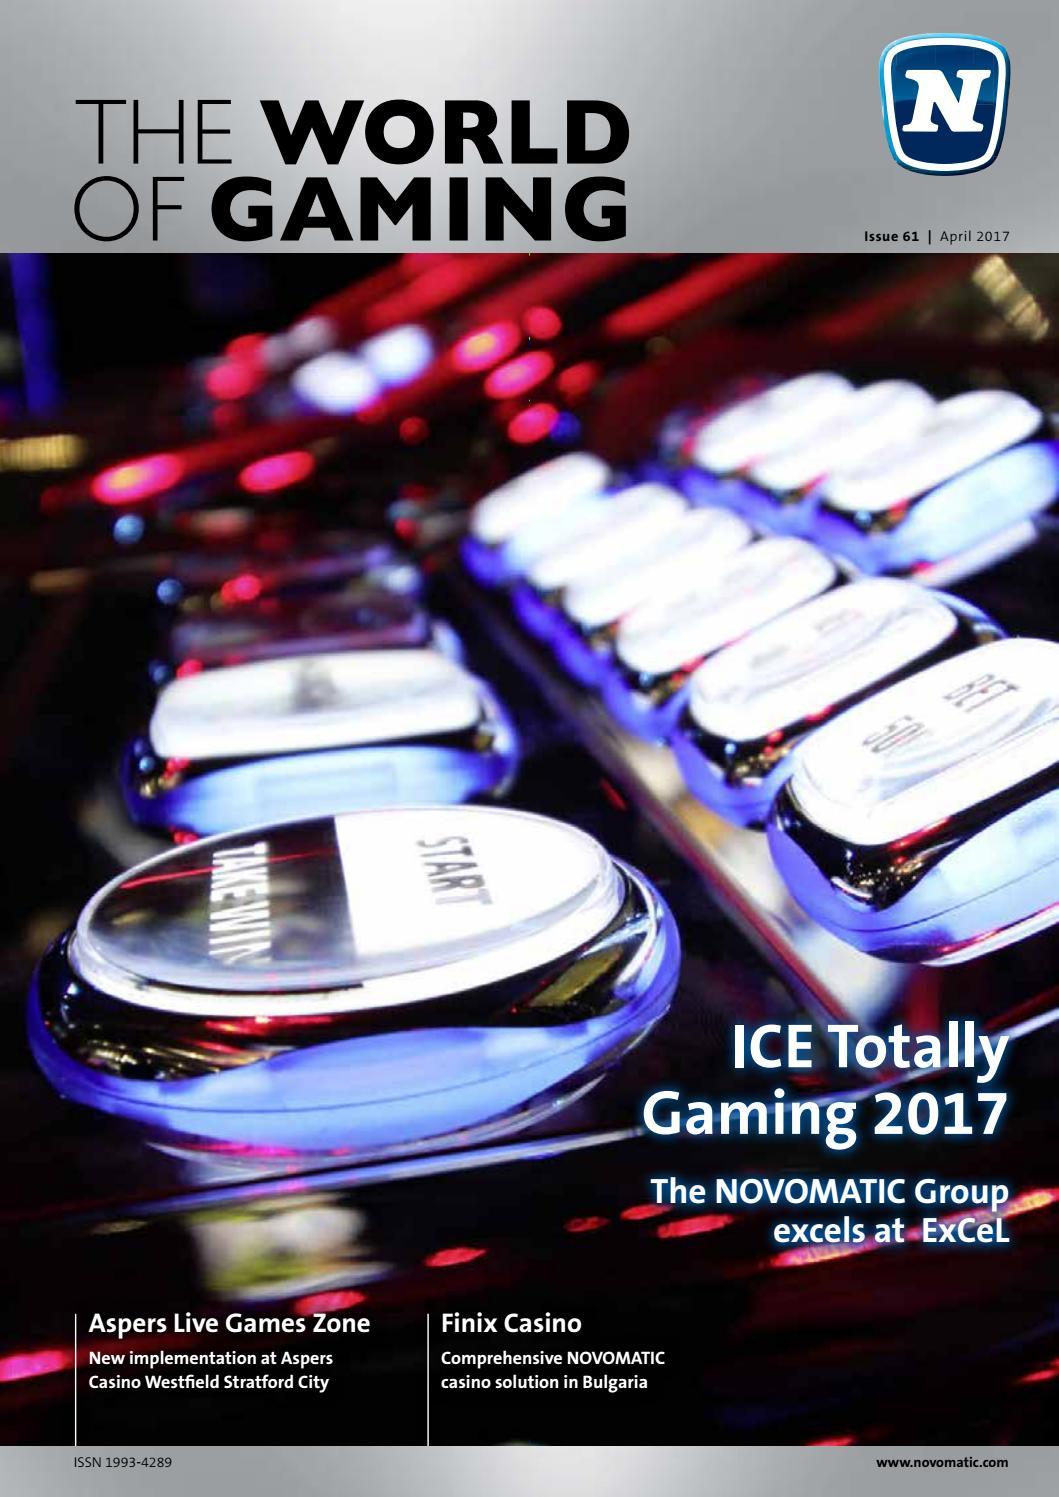 Treffen singles aus gaming: Slow dating pitten